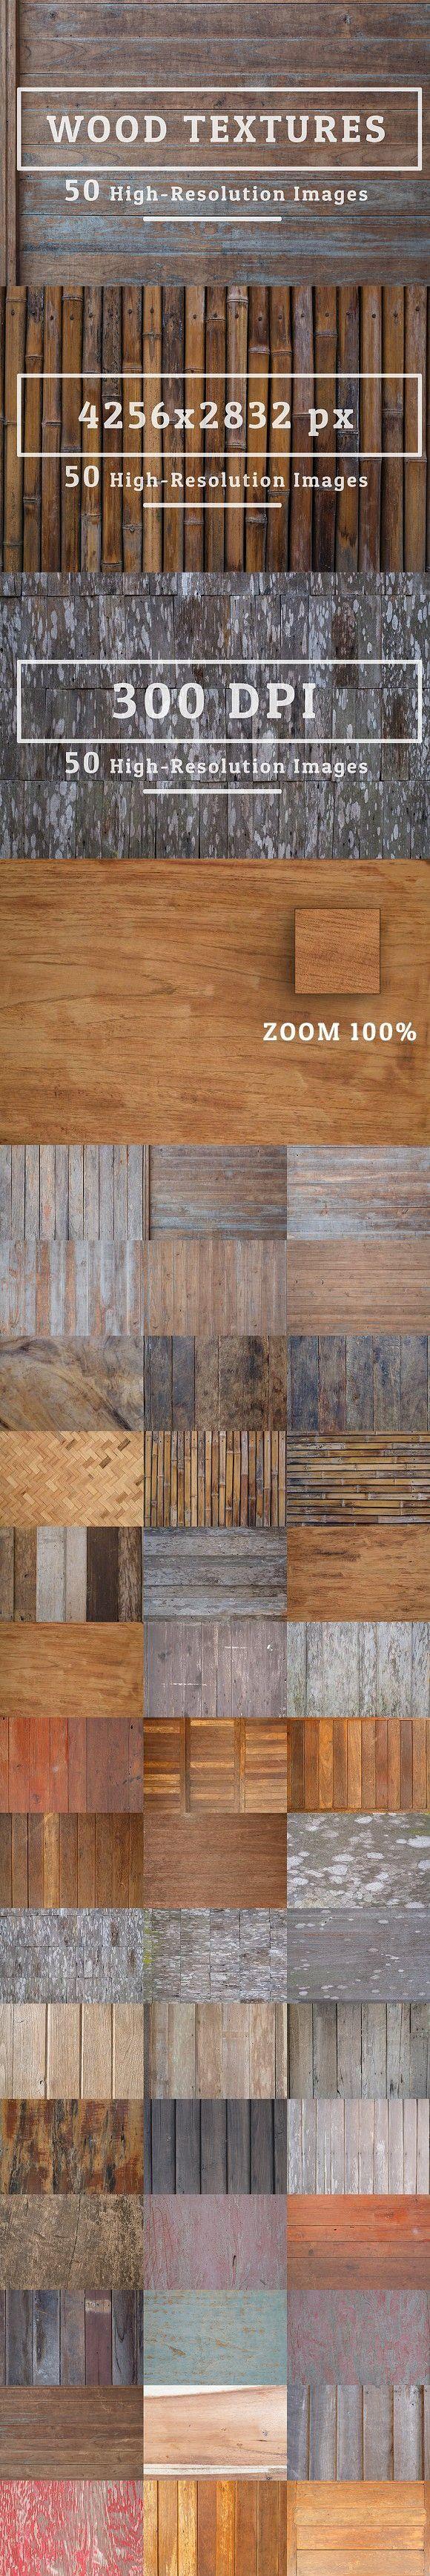 50 Wood Texture Background Set 10. Textures. $12.00